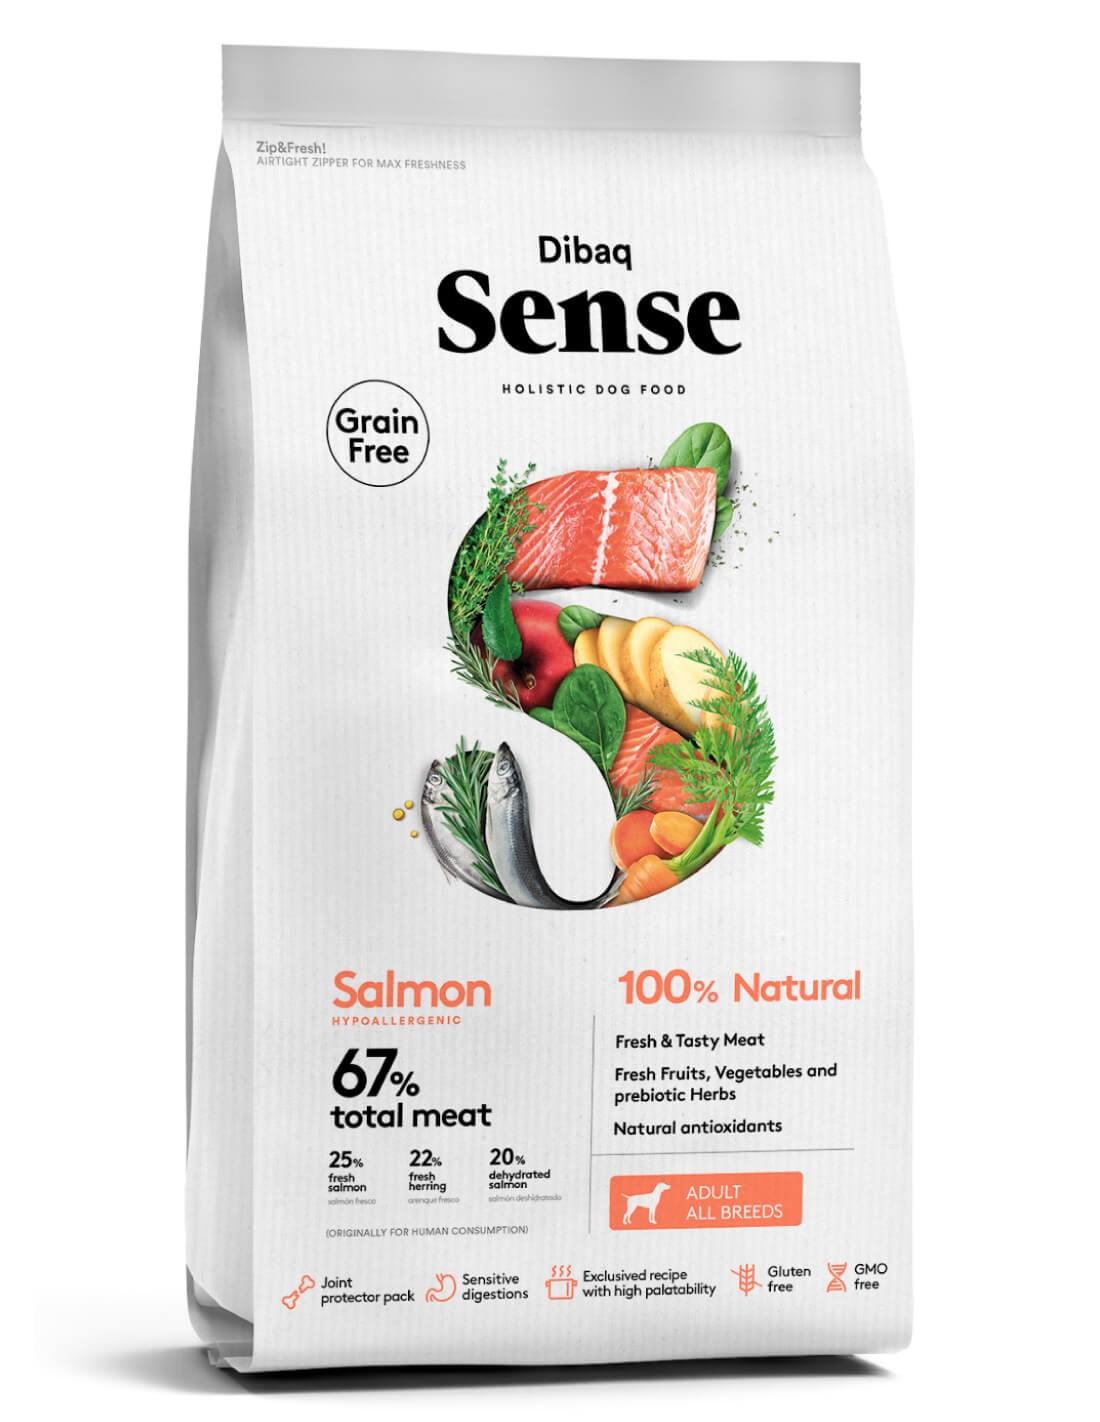 DIBAQ SENSE Salmón Grain Free - Adulto